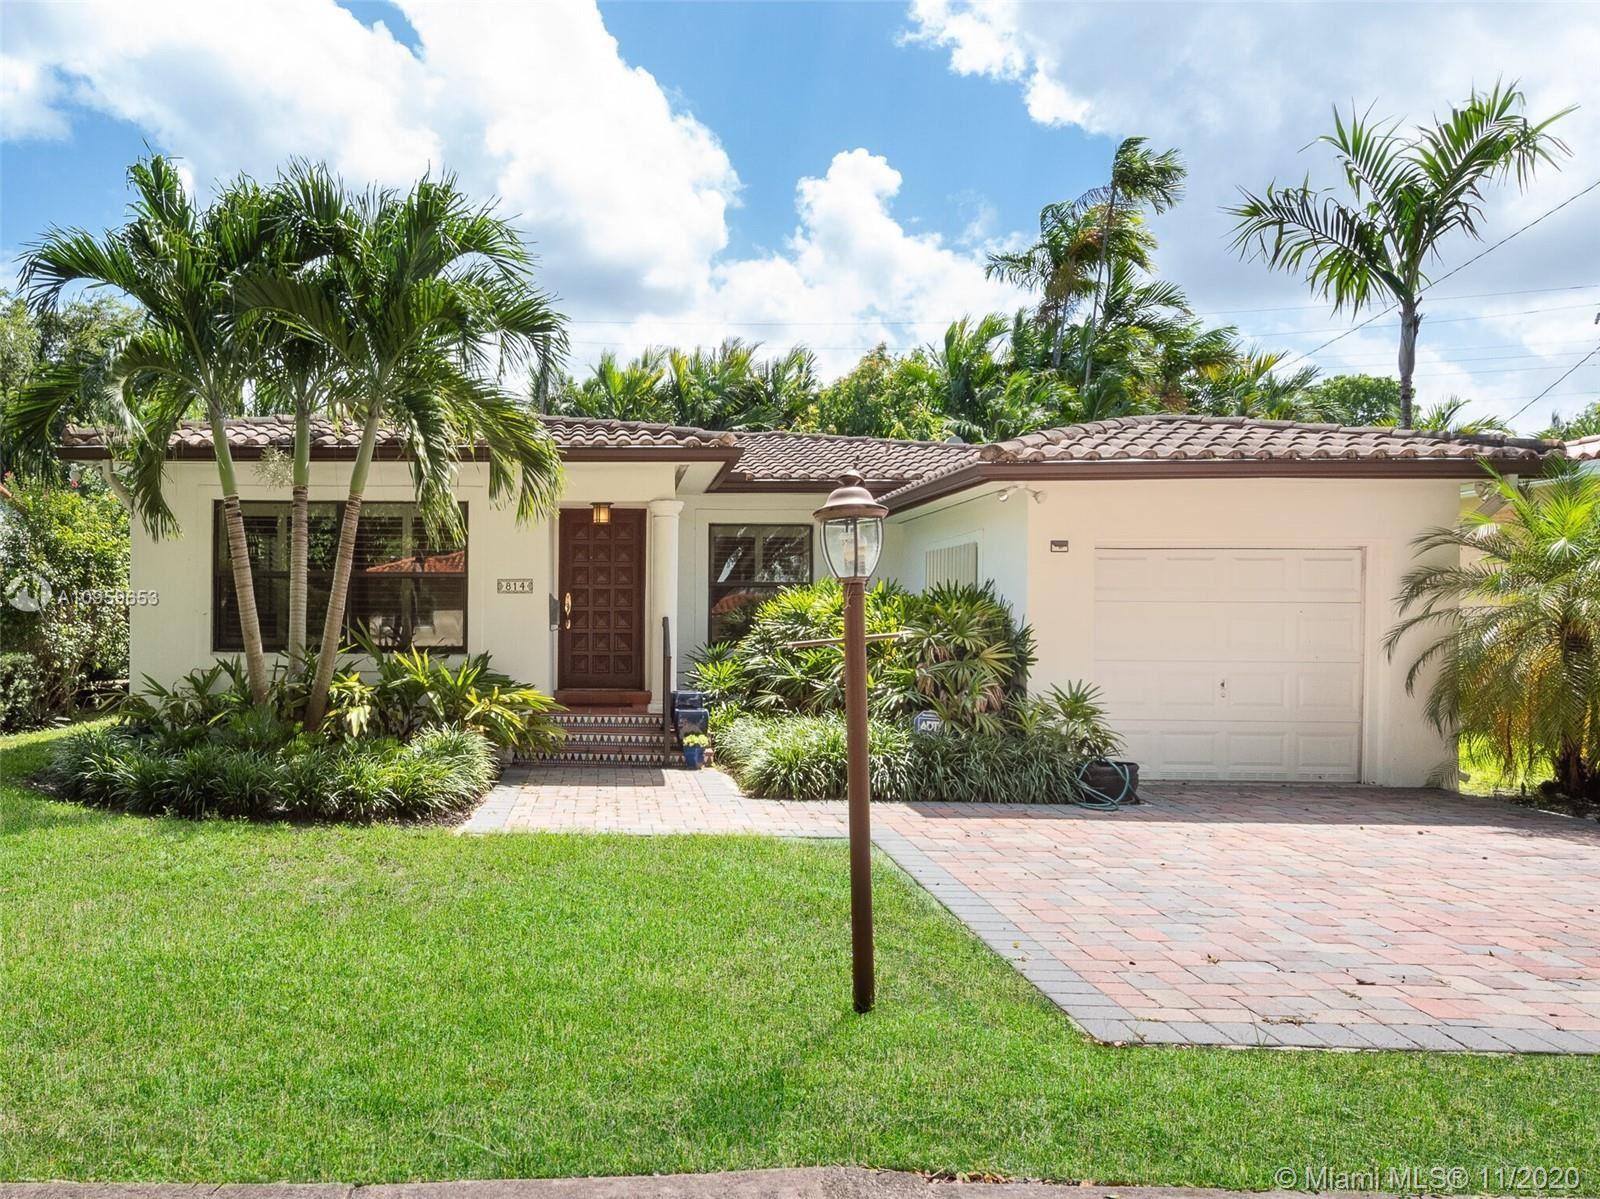 814 Mariana Ave, Coral Gables, FL 33134 - #: A10959653